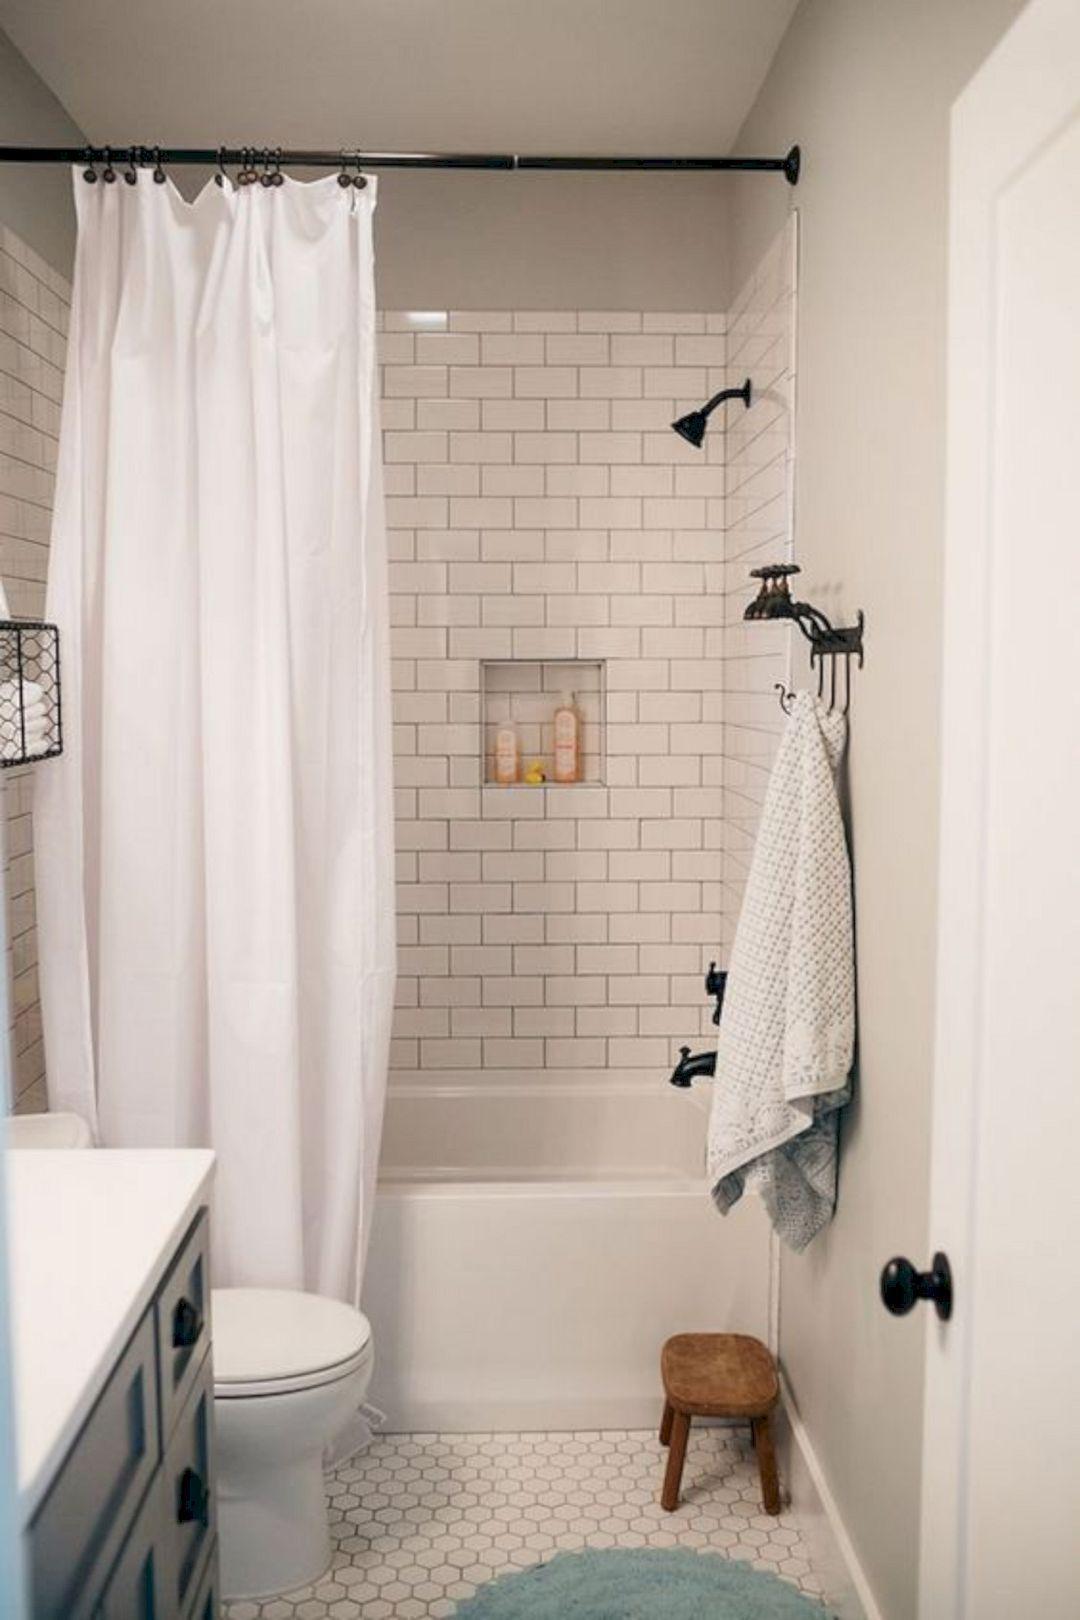 Beau 16 Small Bathroom Renovation Ideas  Https://www.futuristarchitecture.com/33113